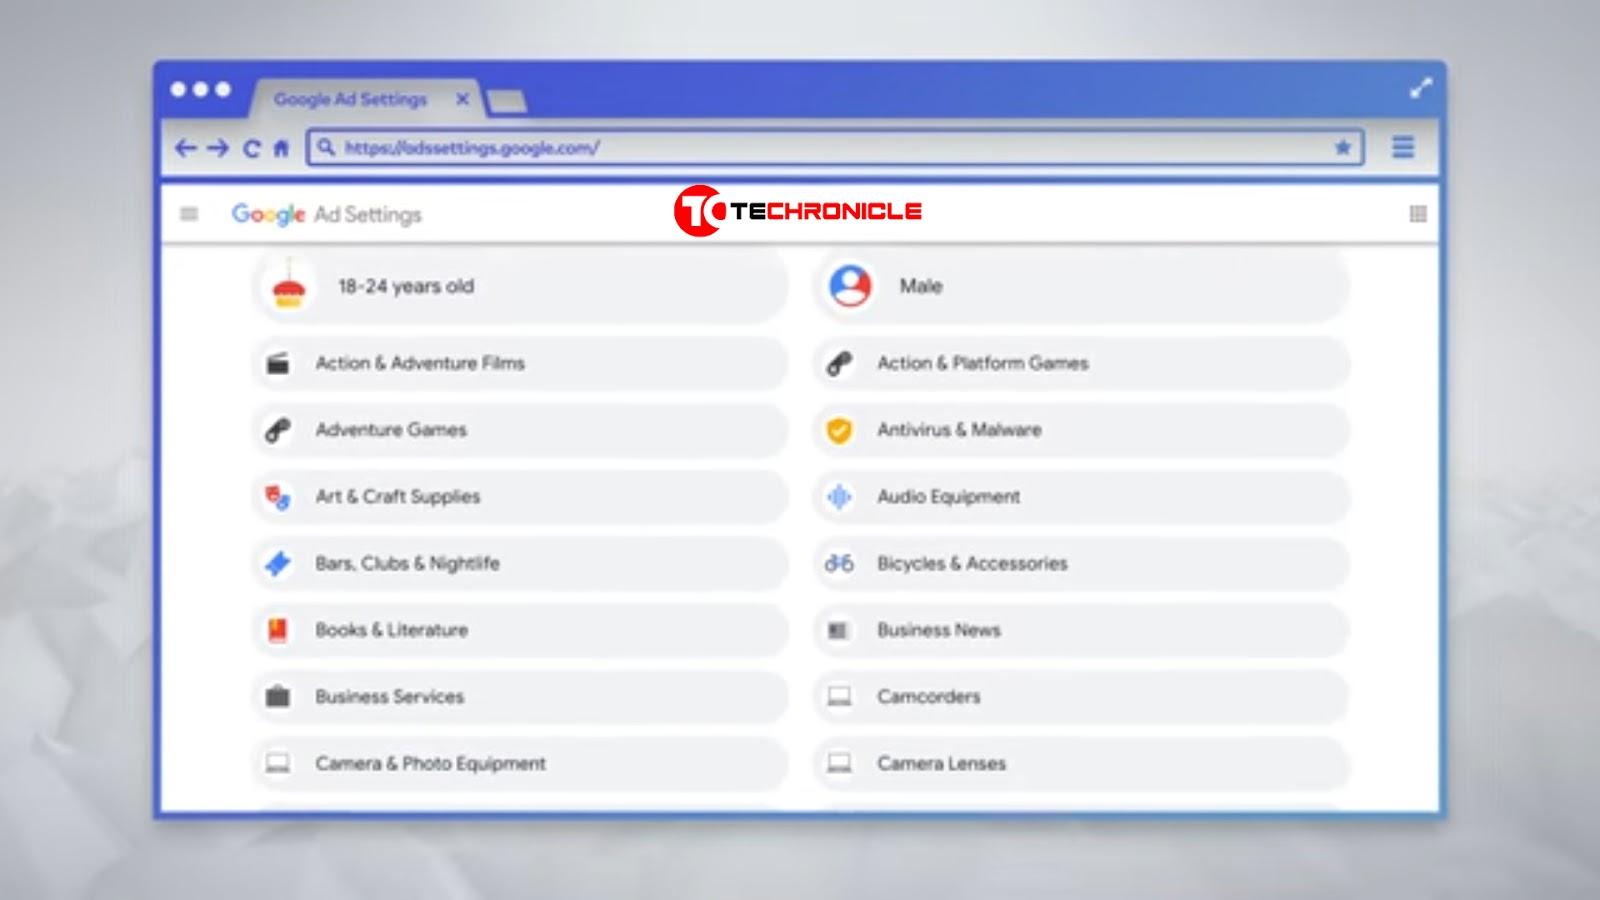 Google Ad Settings Screenshot Techroncile